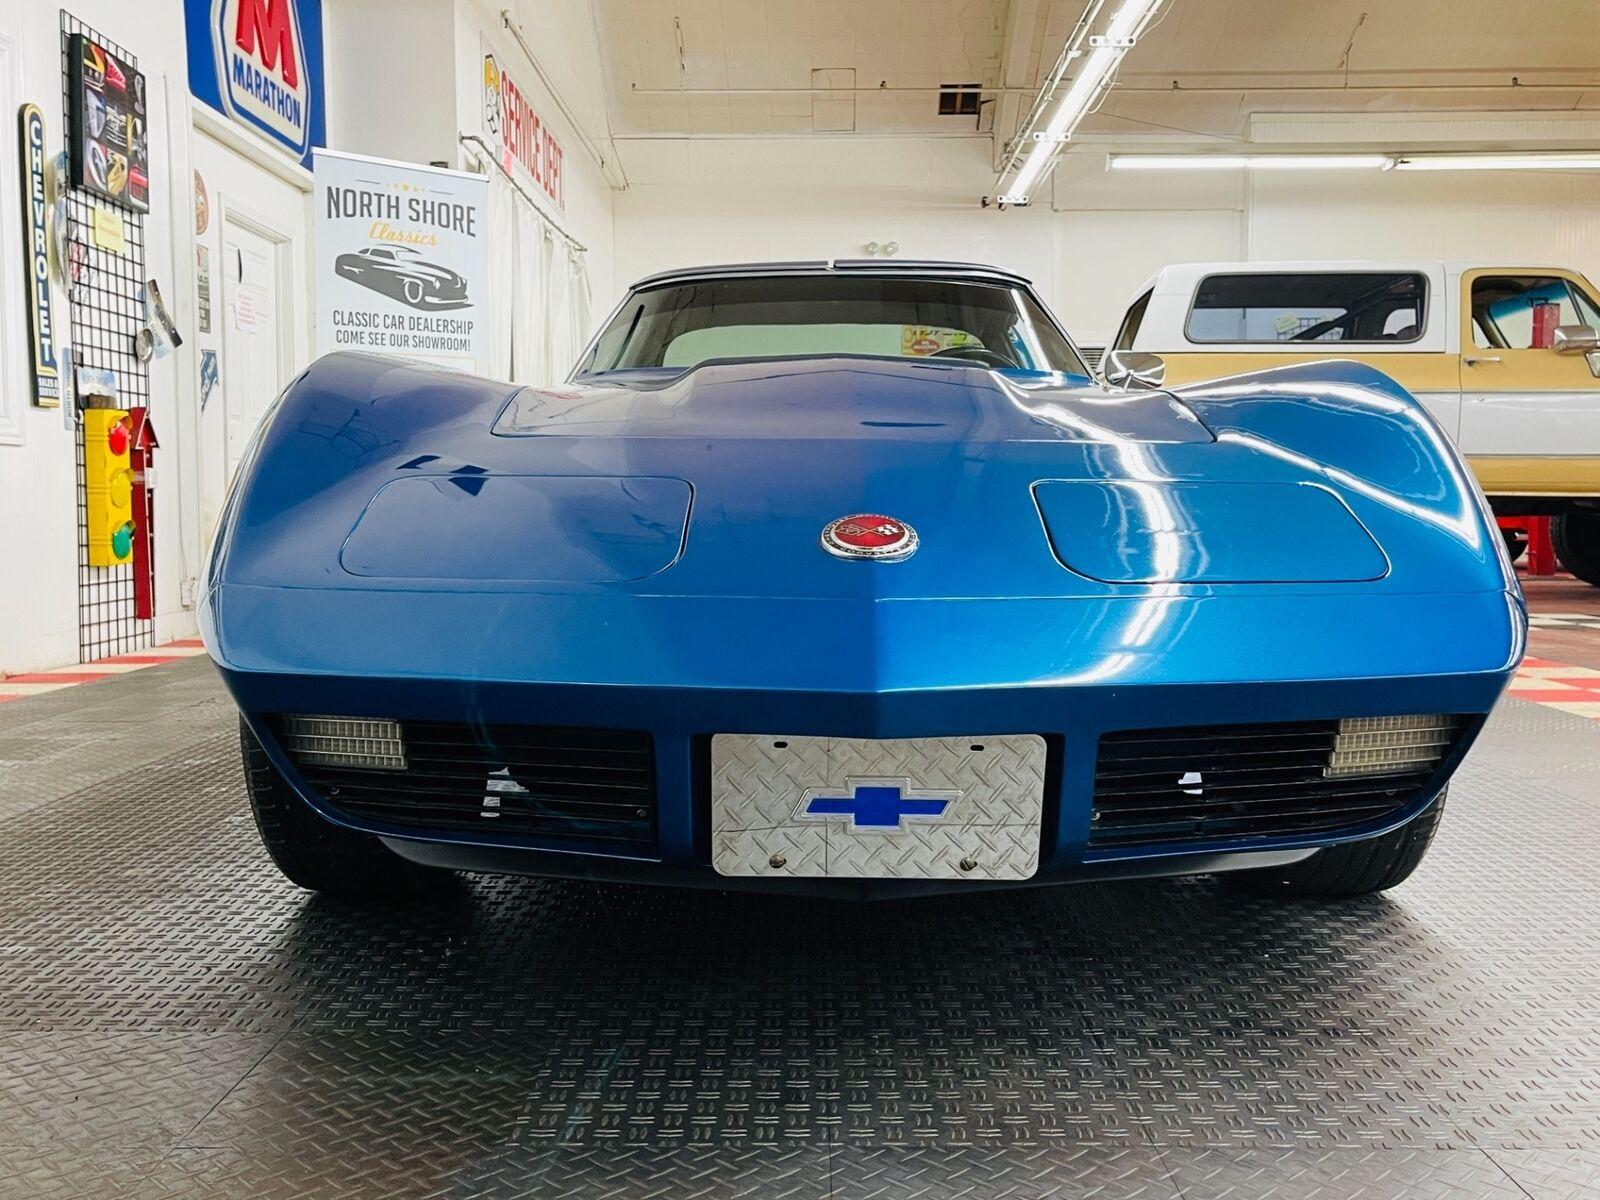 1973 Blue Chevrolet Corvette Coupe  | C3 Corvette Photo 7